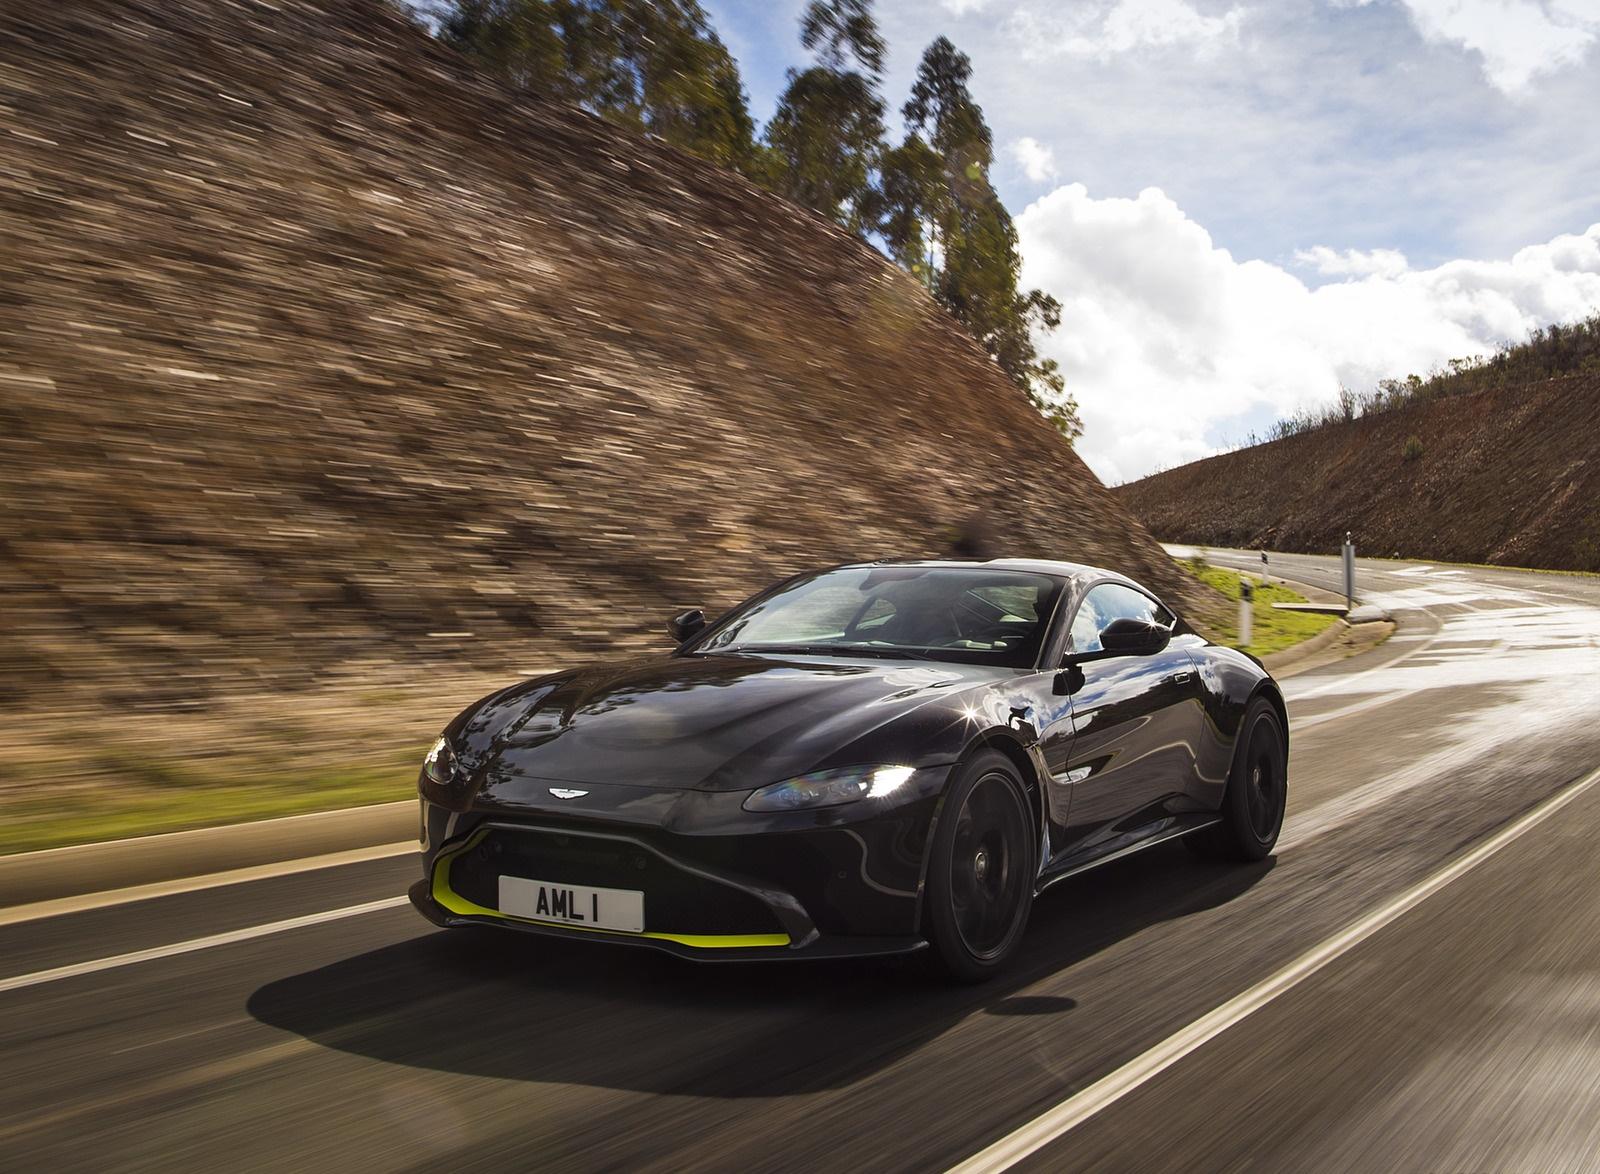 2019 Aston Martin Vantage (Onyx Black) Front Three-Quarter Wallpapers (6)